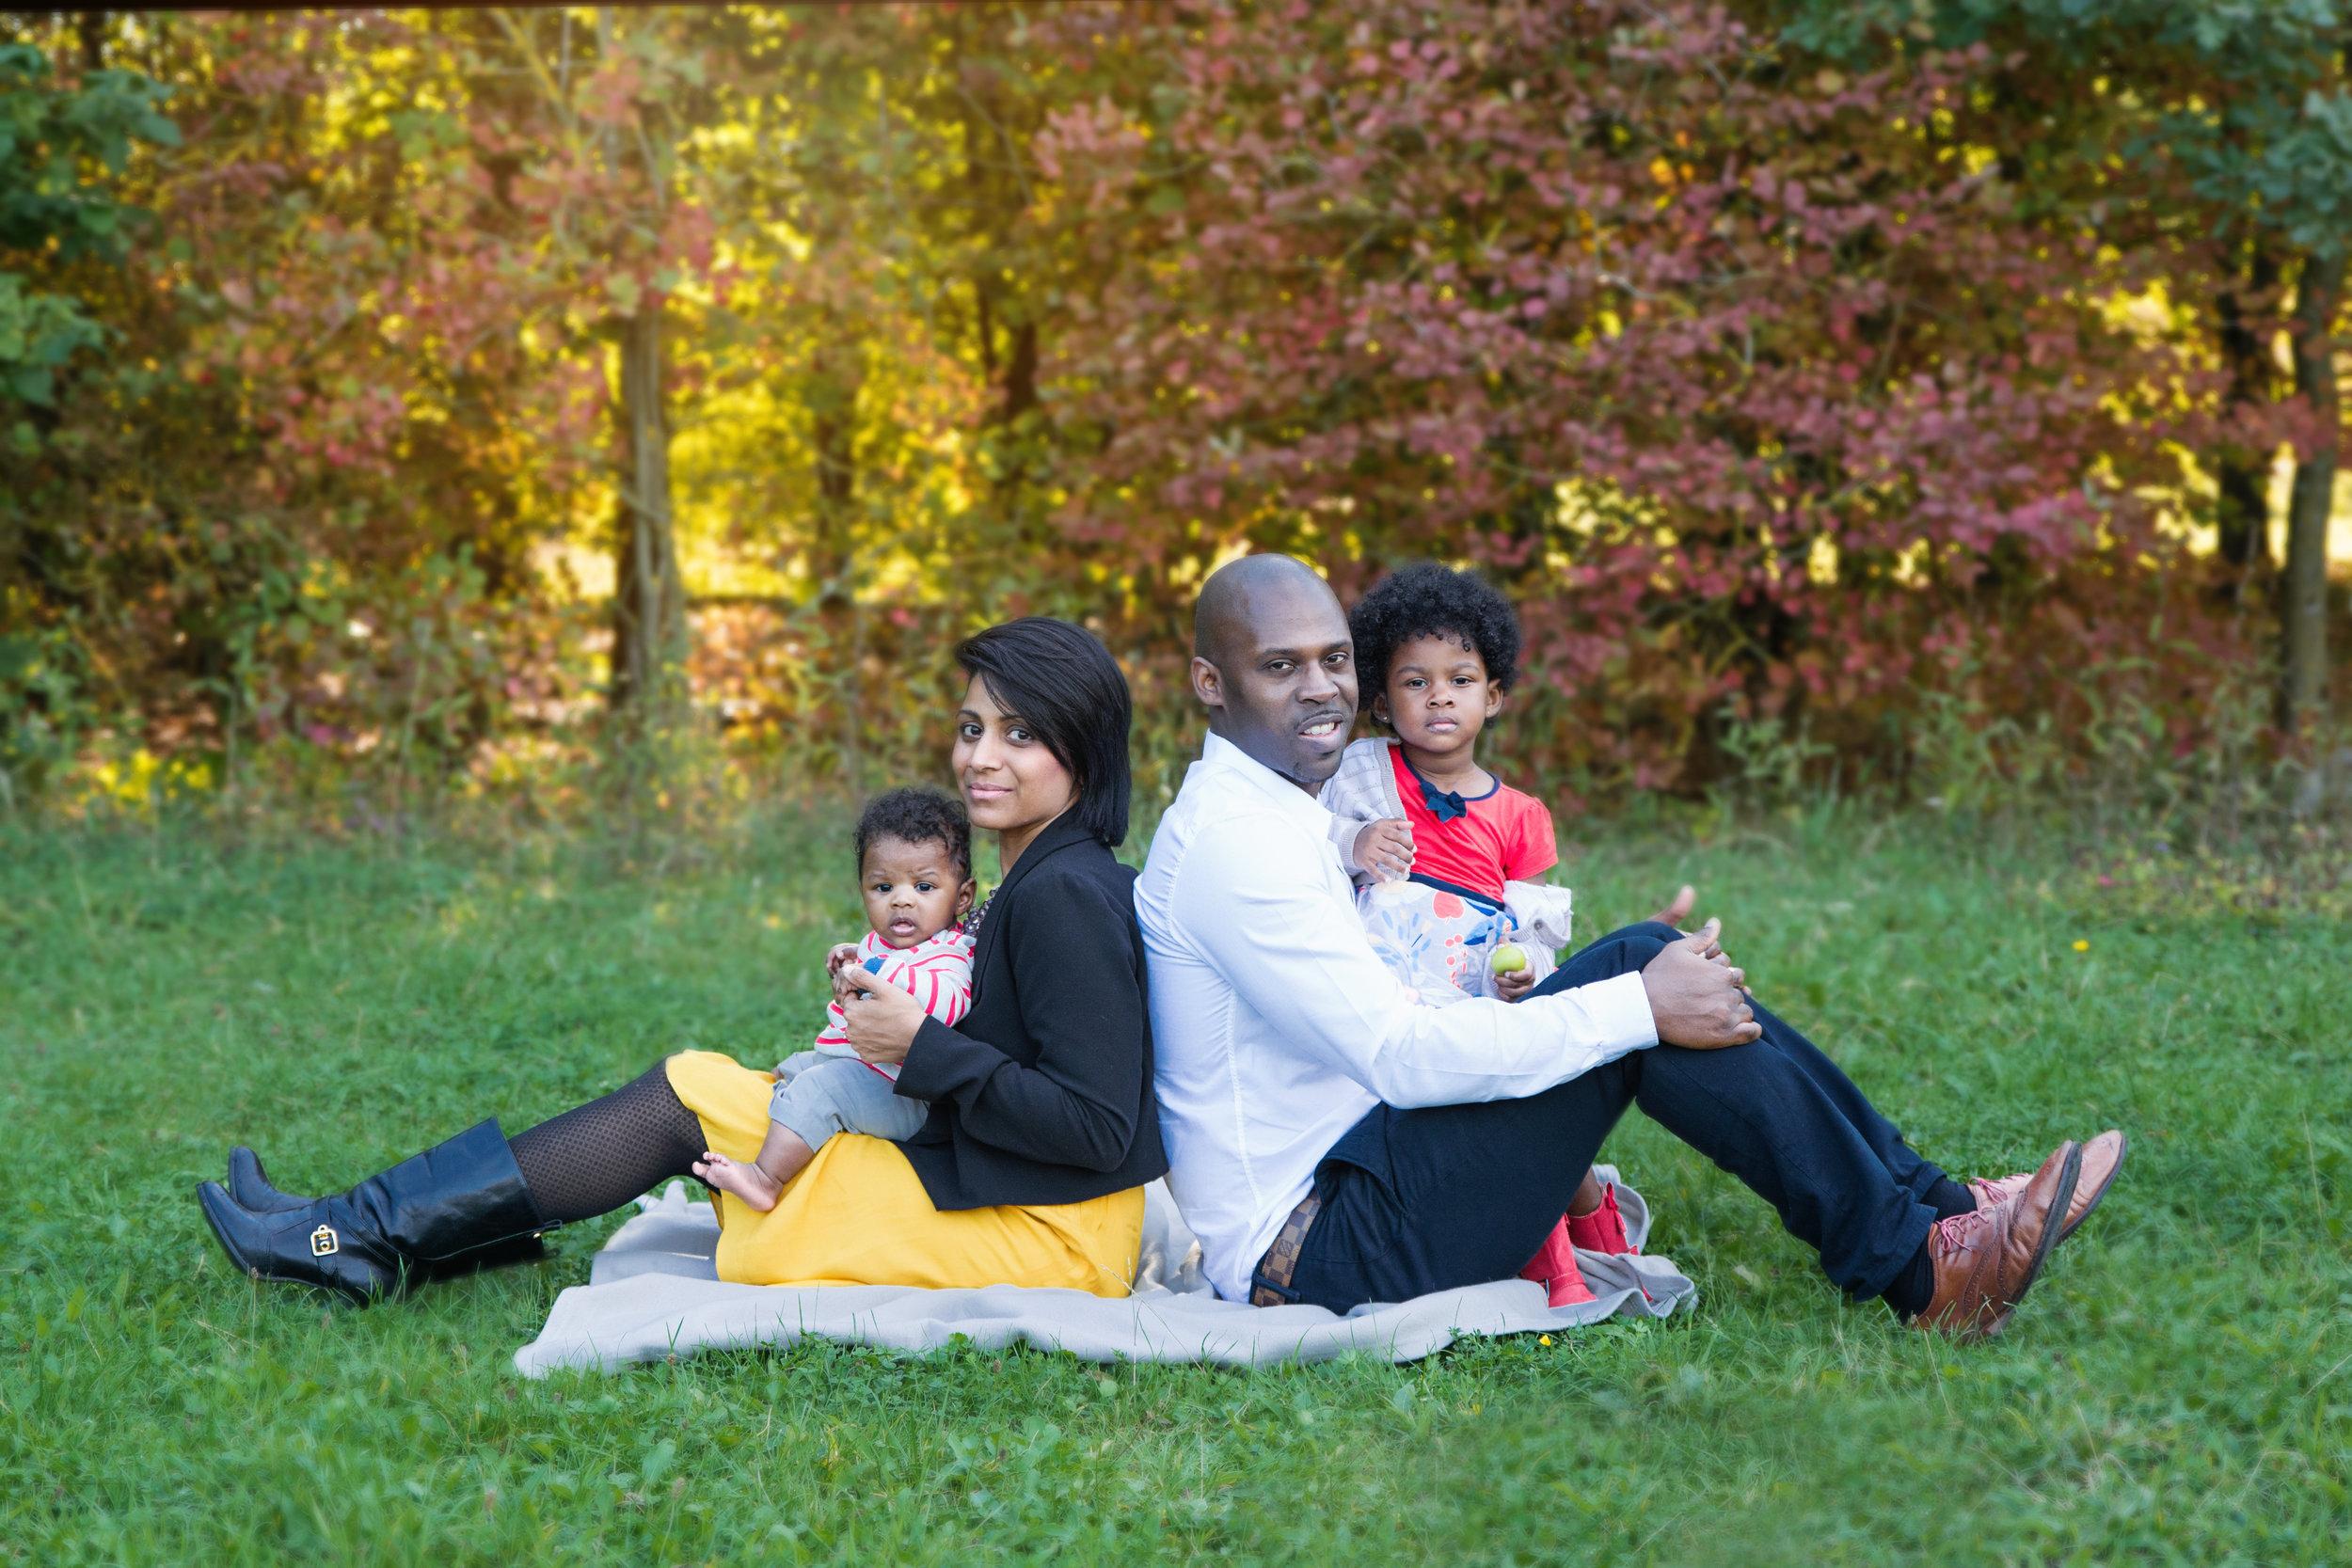 FEATURED MULTIRACIAL FAMILY: MEET THE BATAMBUZE FAMILY